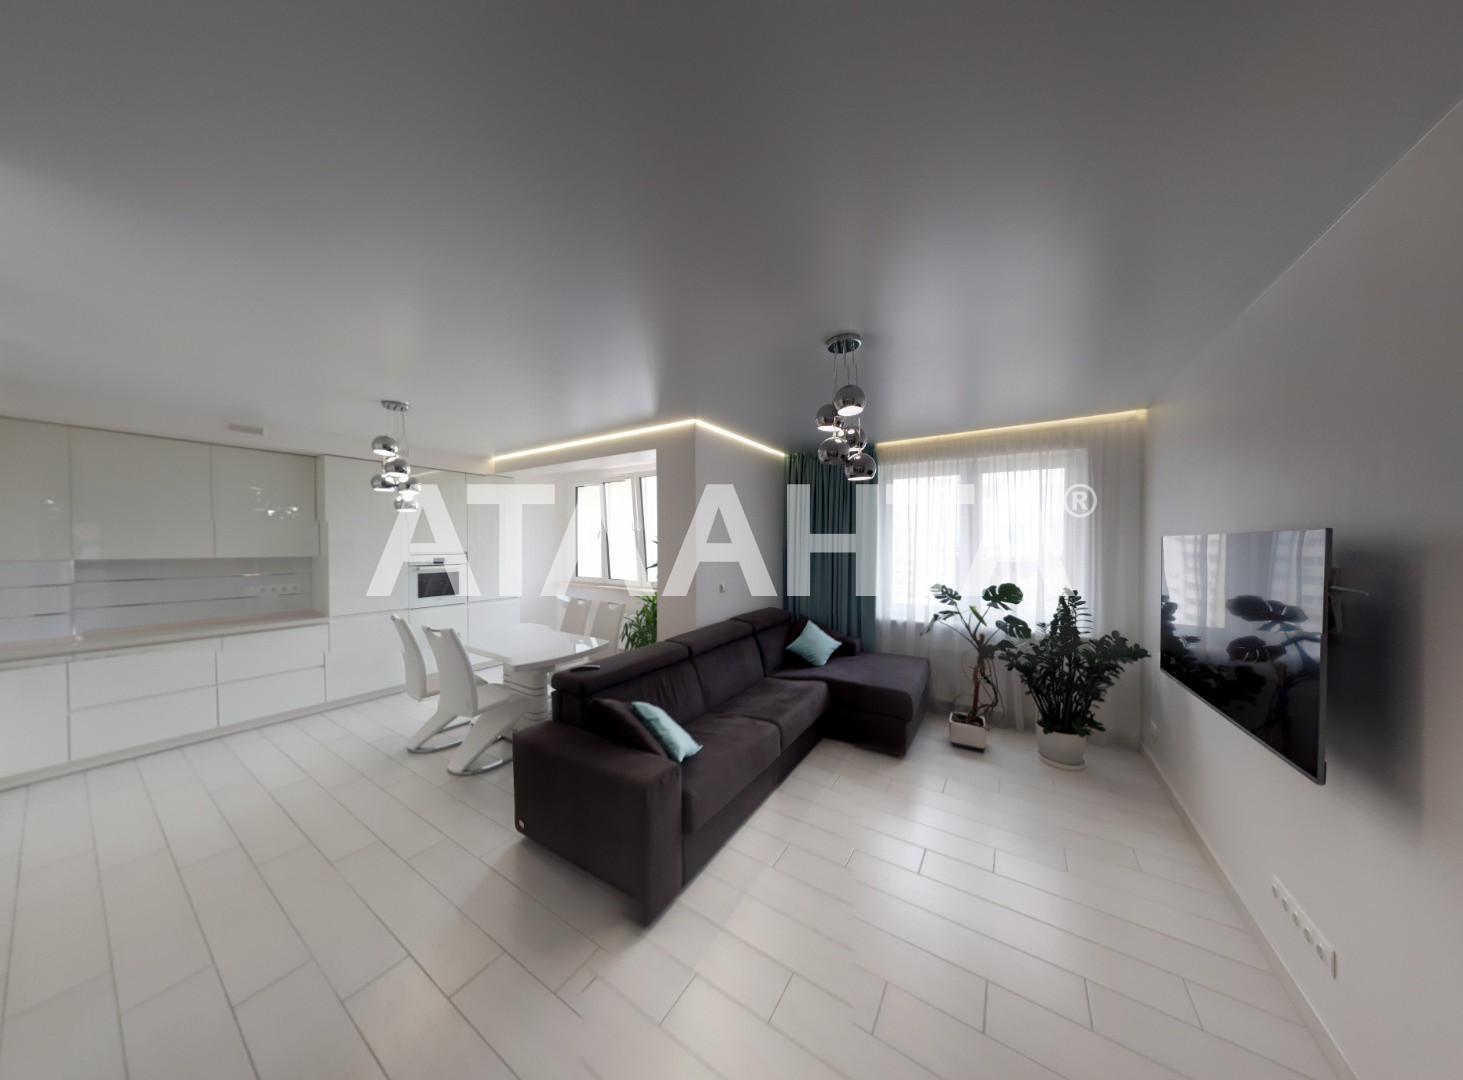 Продается 3-комнатная Квартира на ул. Просп. Глушкова — 160 000 у.е. (фото №24)